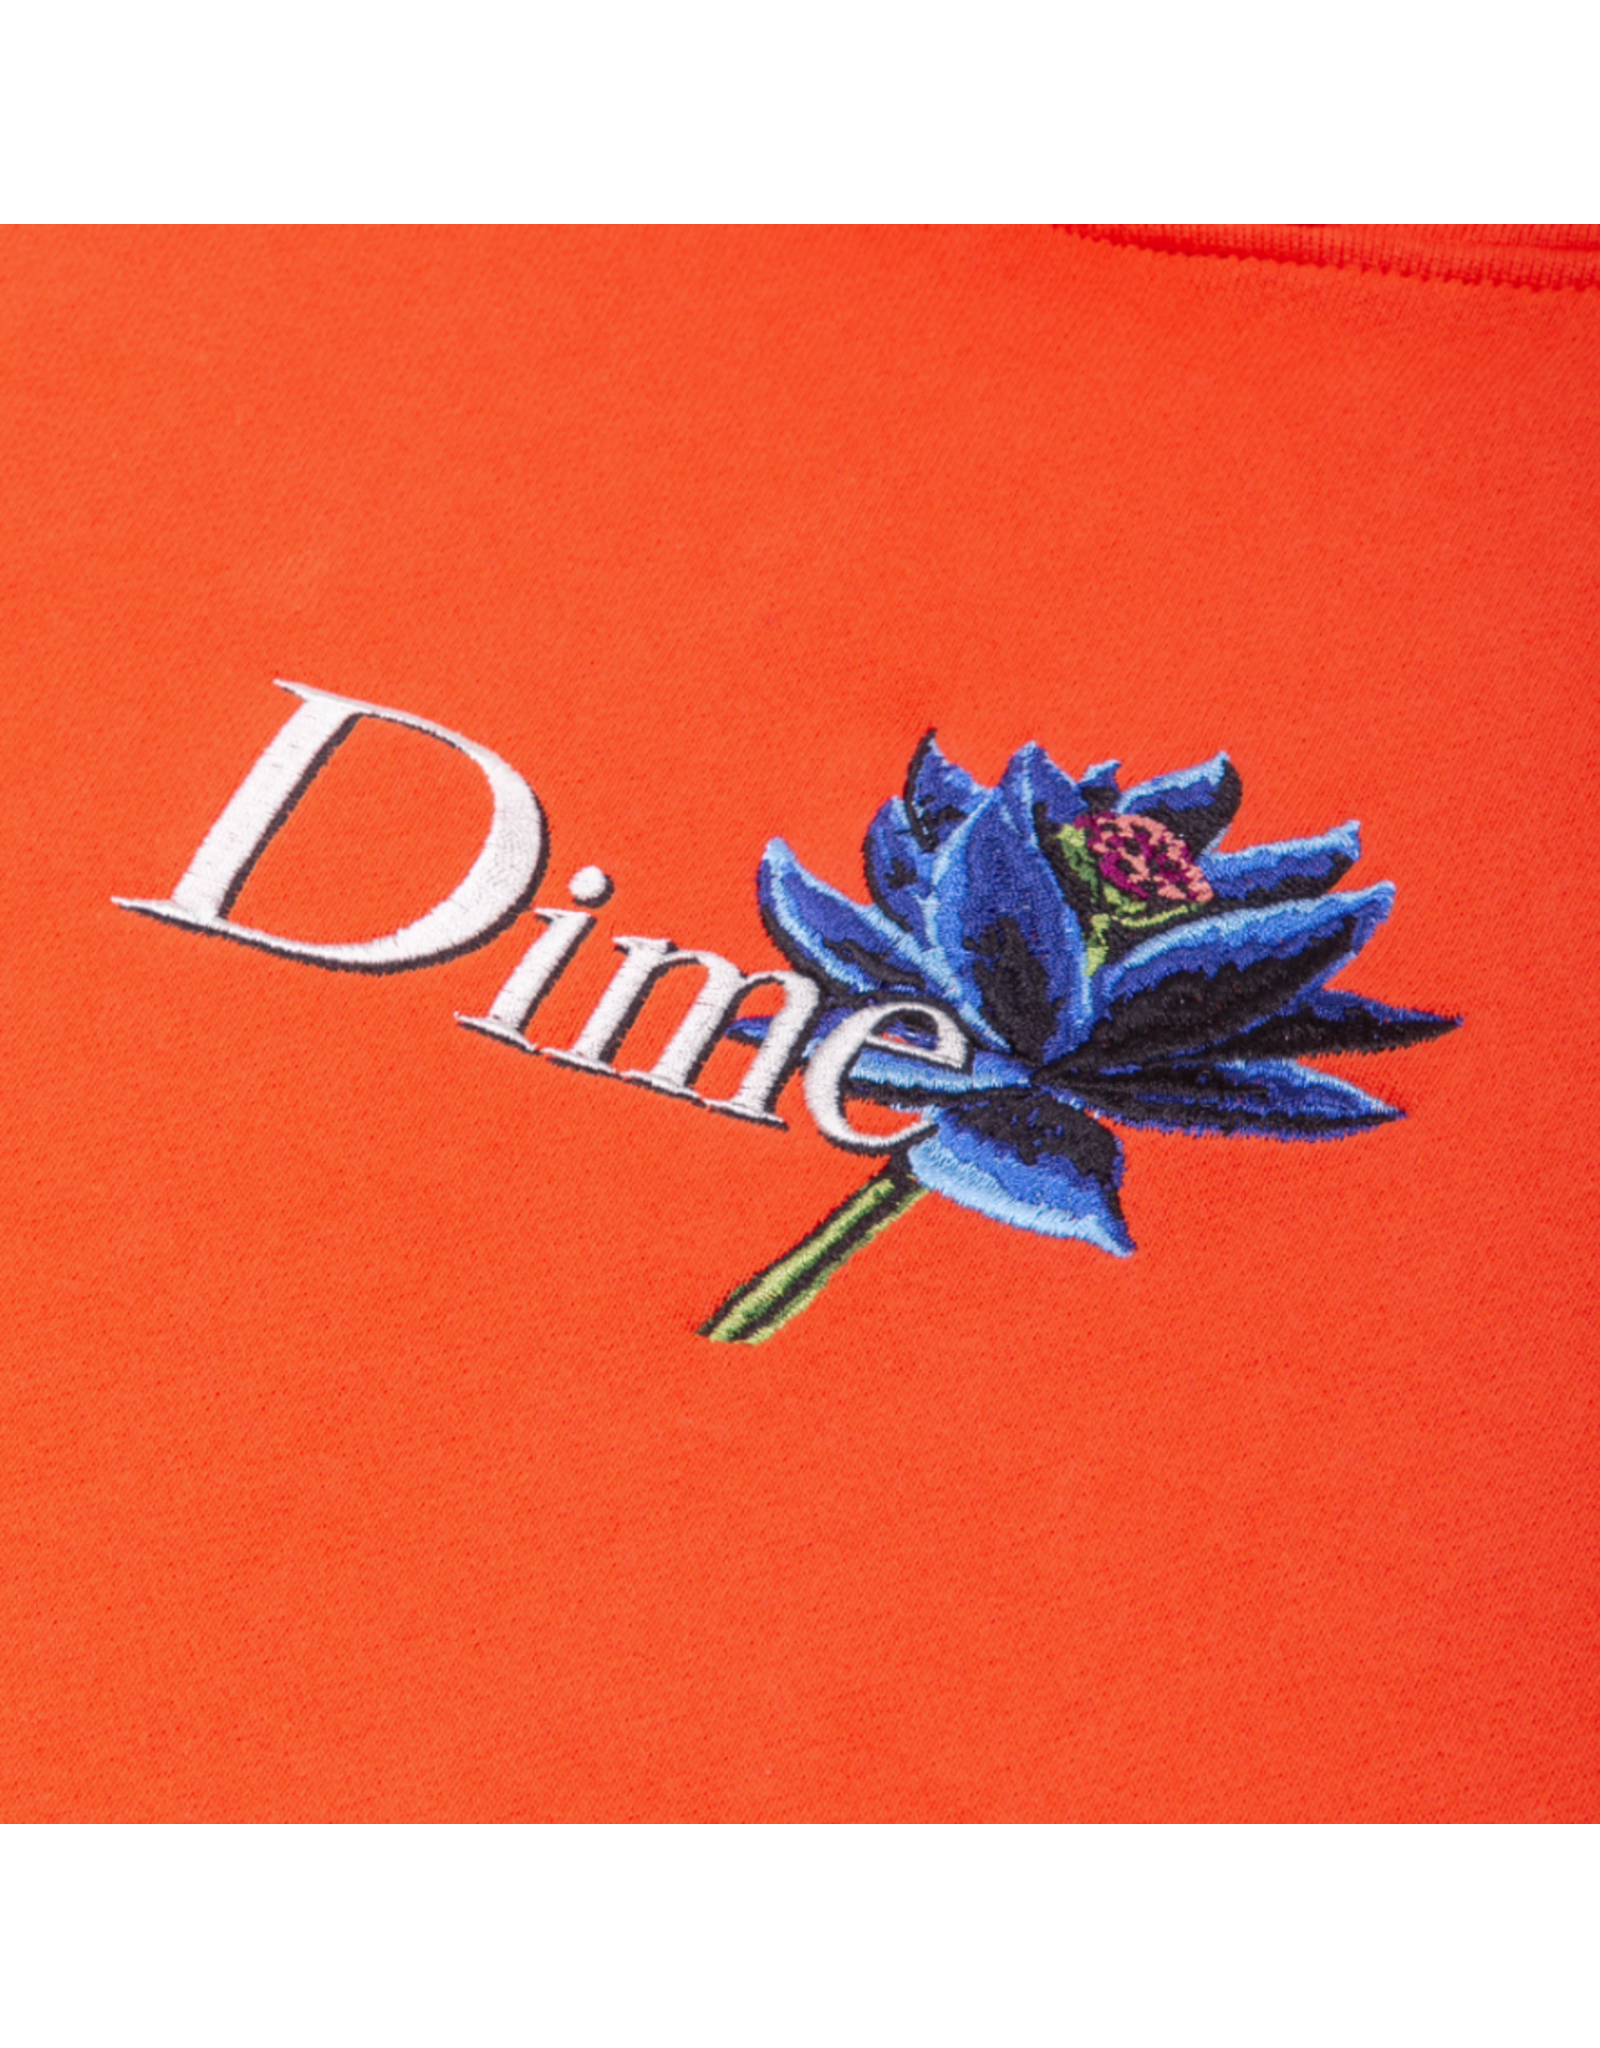 Dime Black Lotus - Bright Red